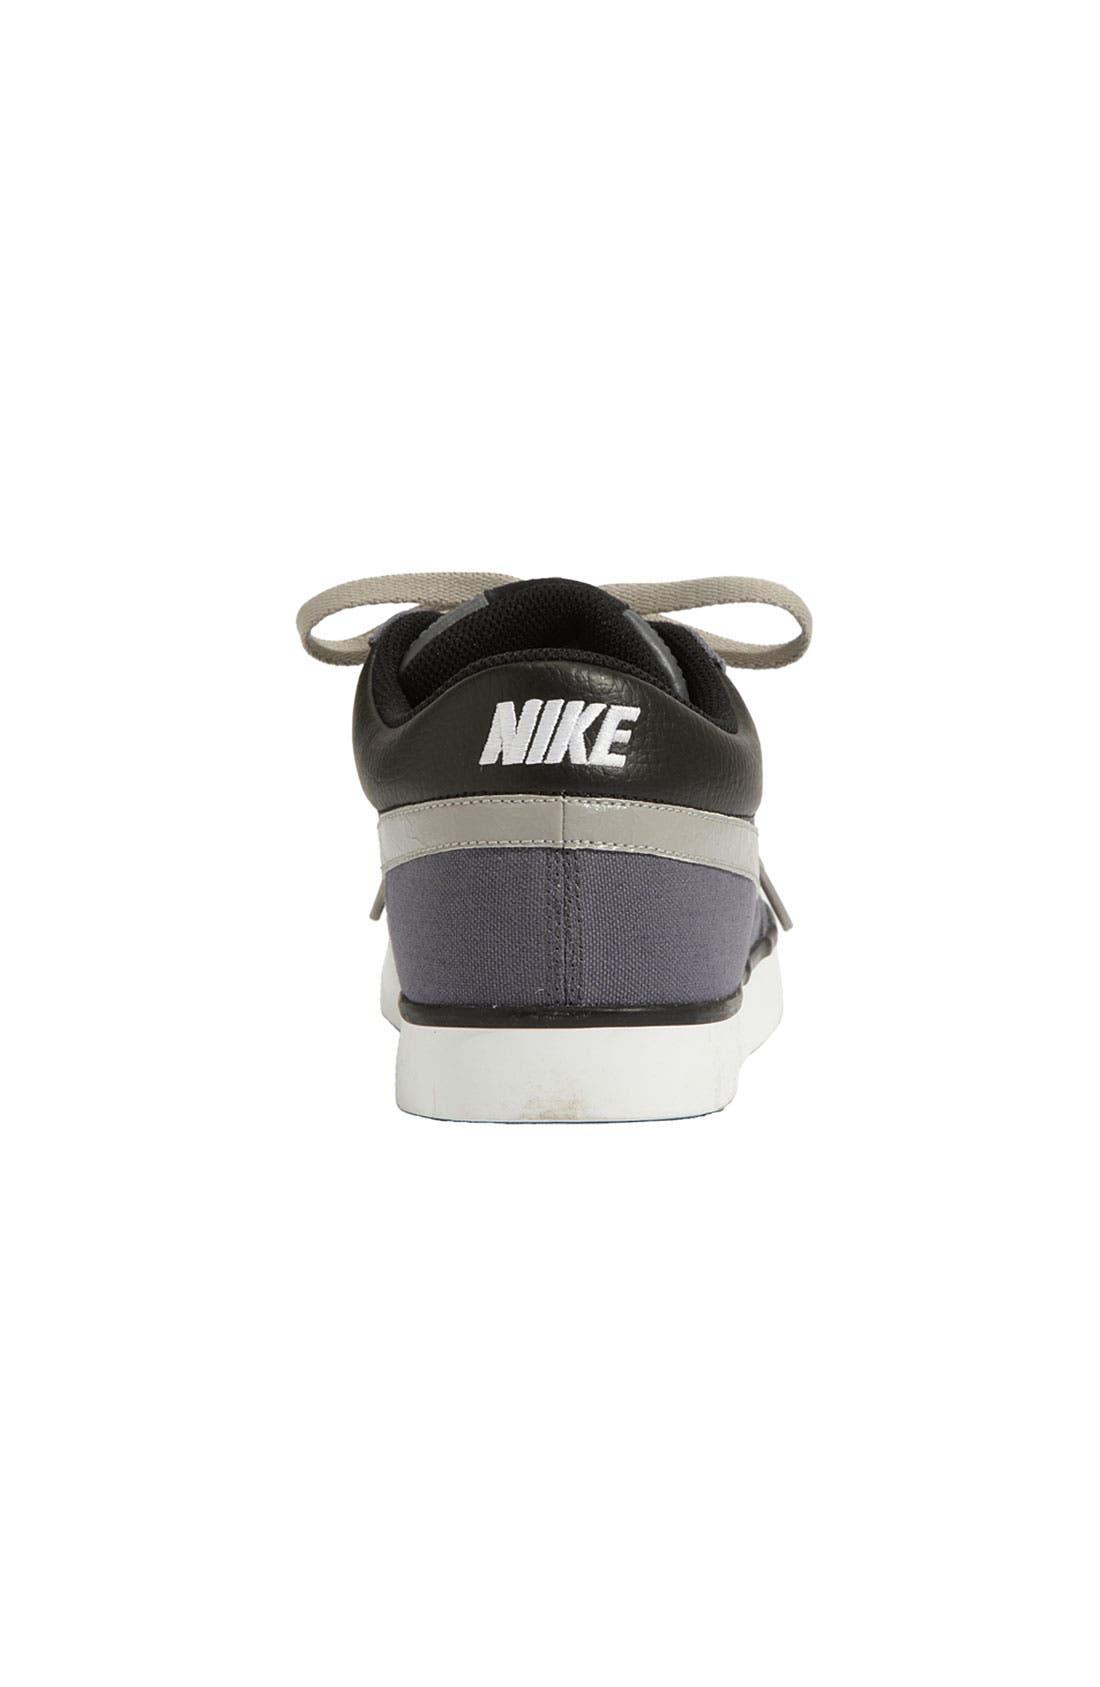 NIKE,                             'Avid' Sneaker,                             Alternate thumbnail 3, color,                             002